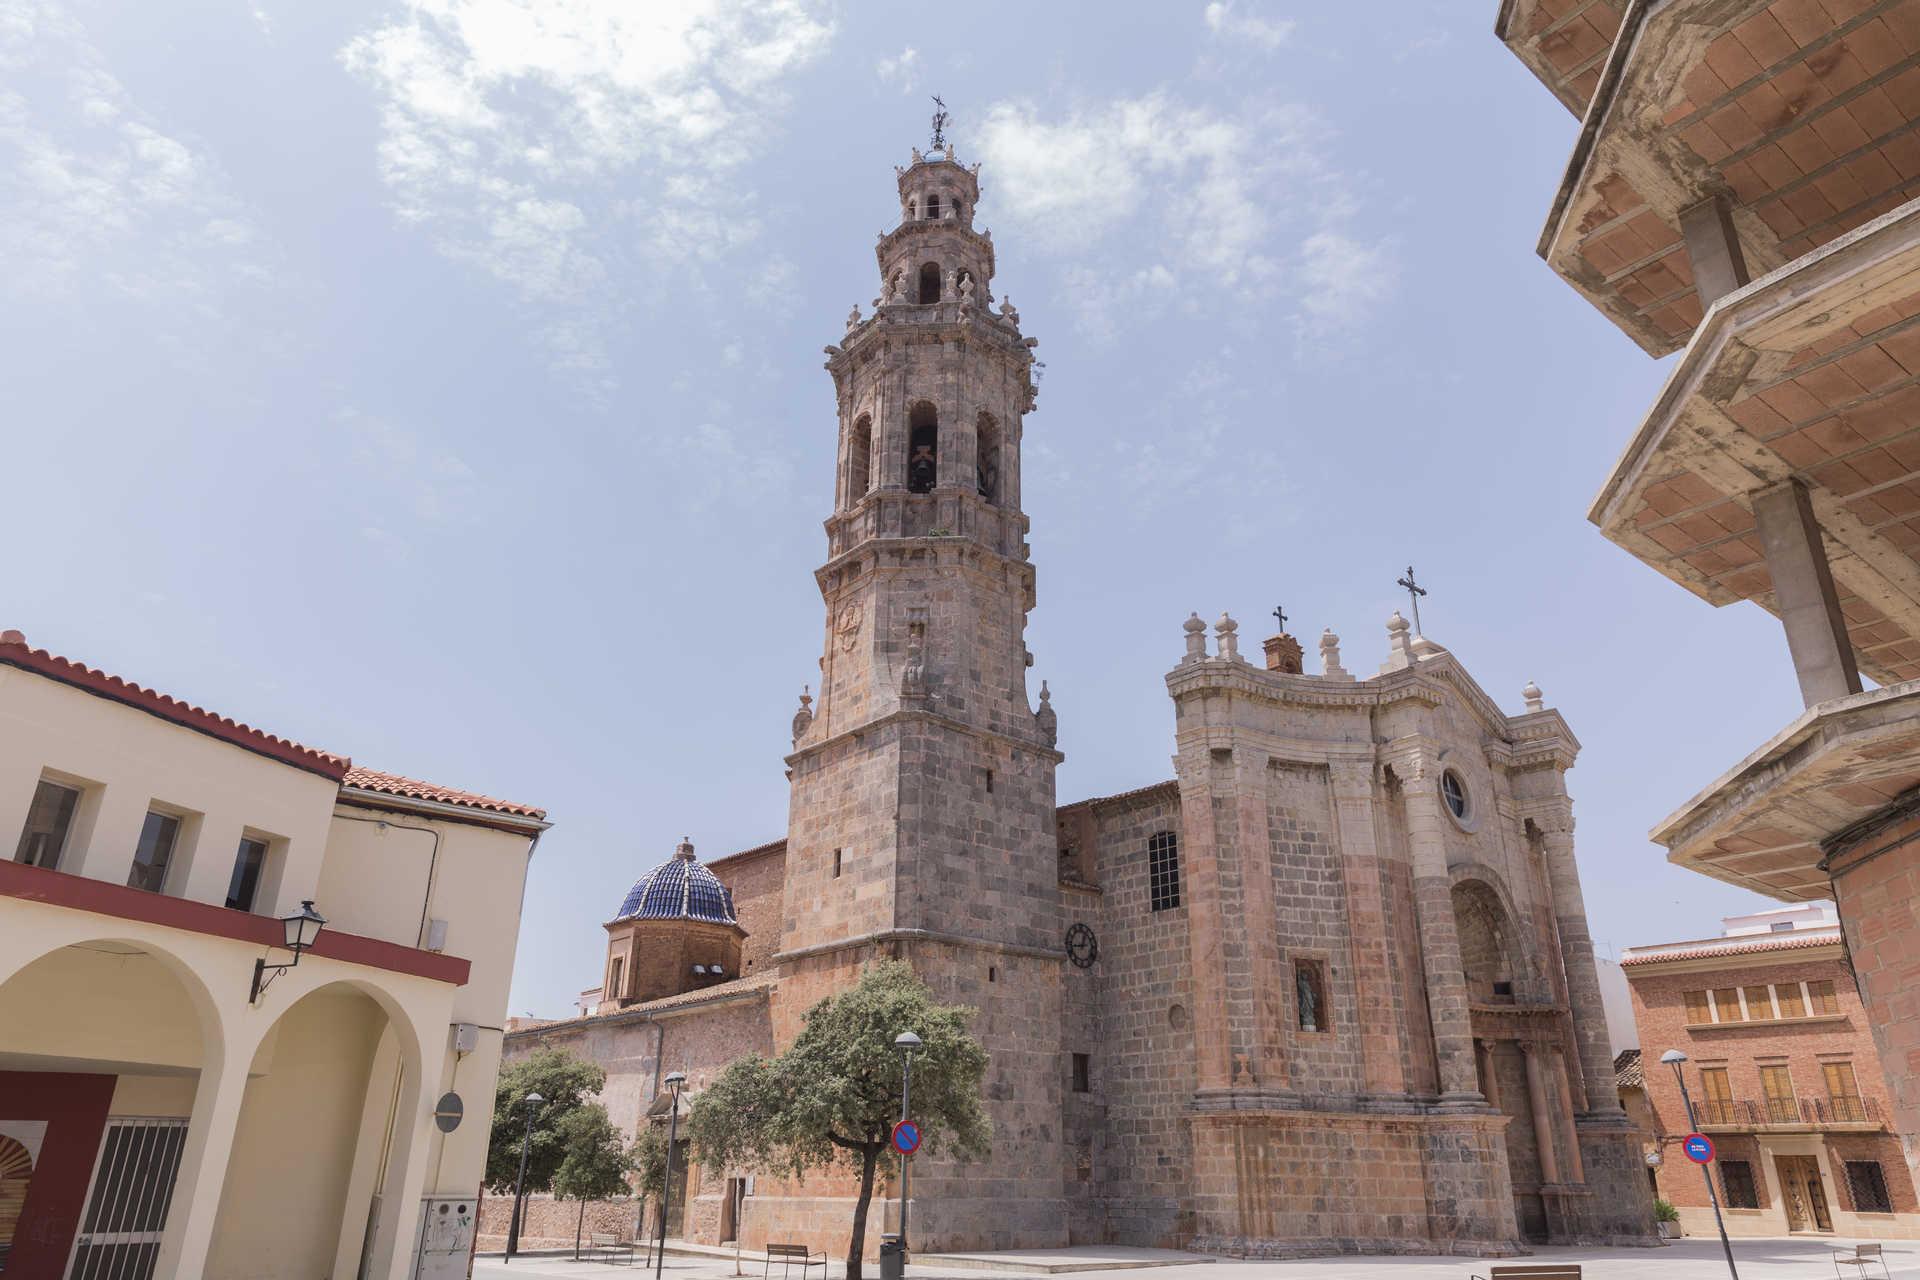 https://multimedia.comunitatvalenciana.com/8C813950E1E04293AC2280E2028F1DDD/img/4BF0BB42BE9A40DC8C9F24056631C300/Iglesia_Nuestra_Senora_de_la_Asuncion717-358.jpg?responsive